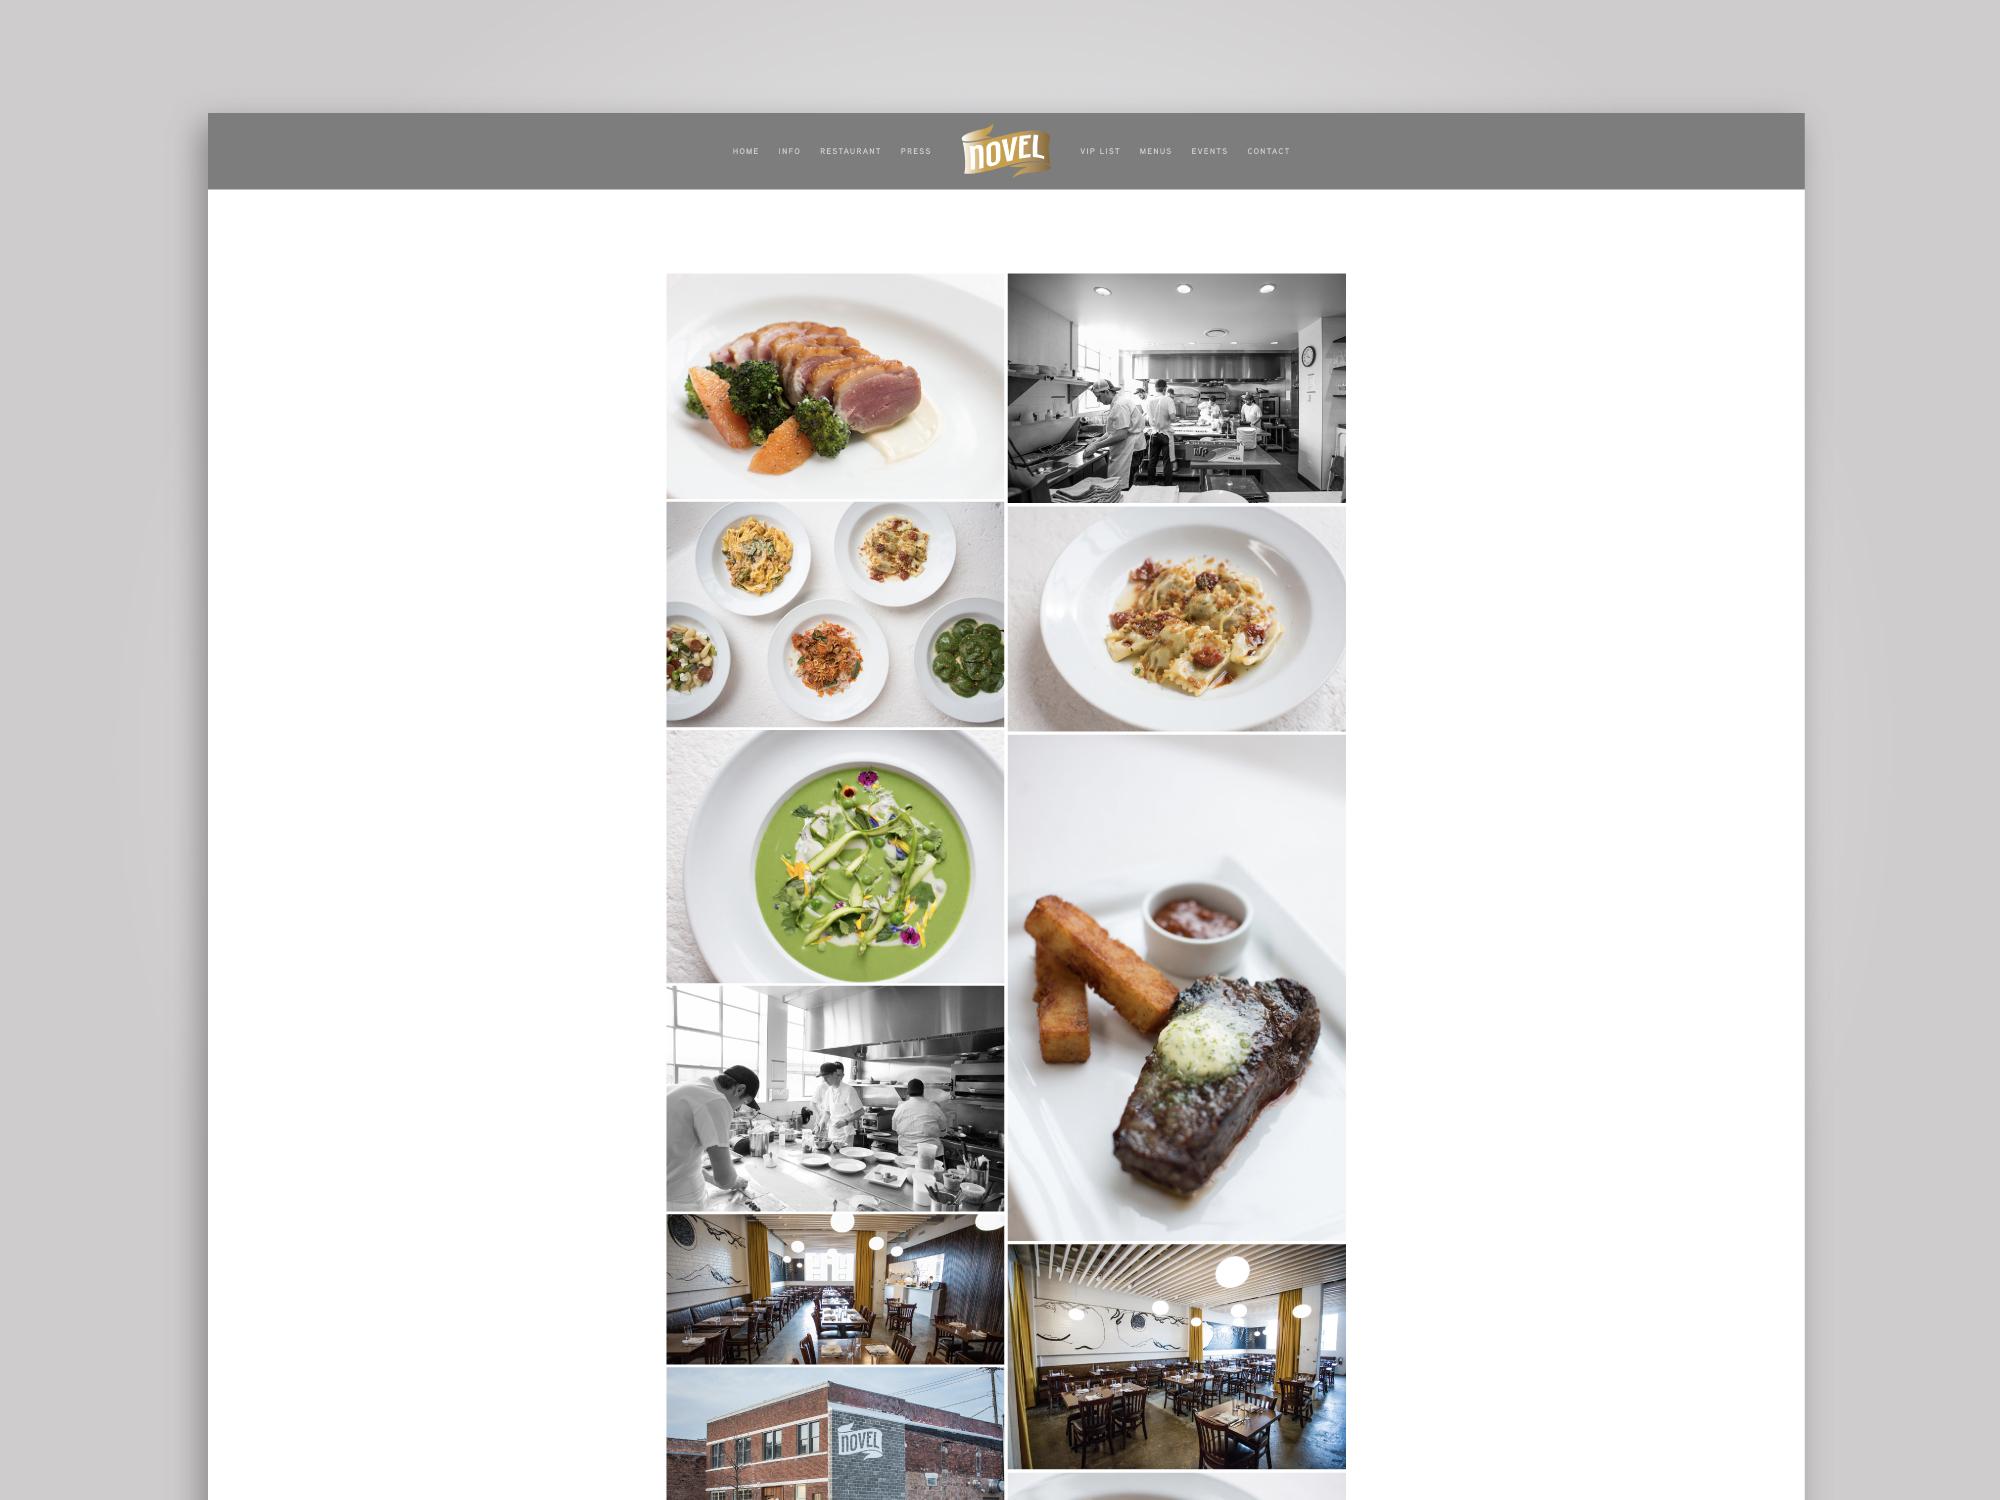 gallery-website-mock-up.jpg